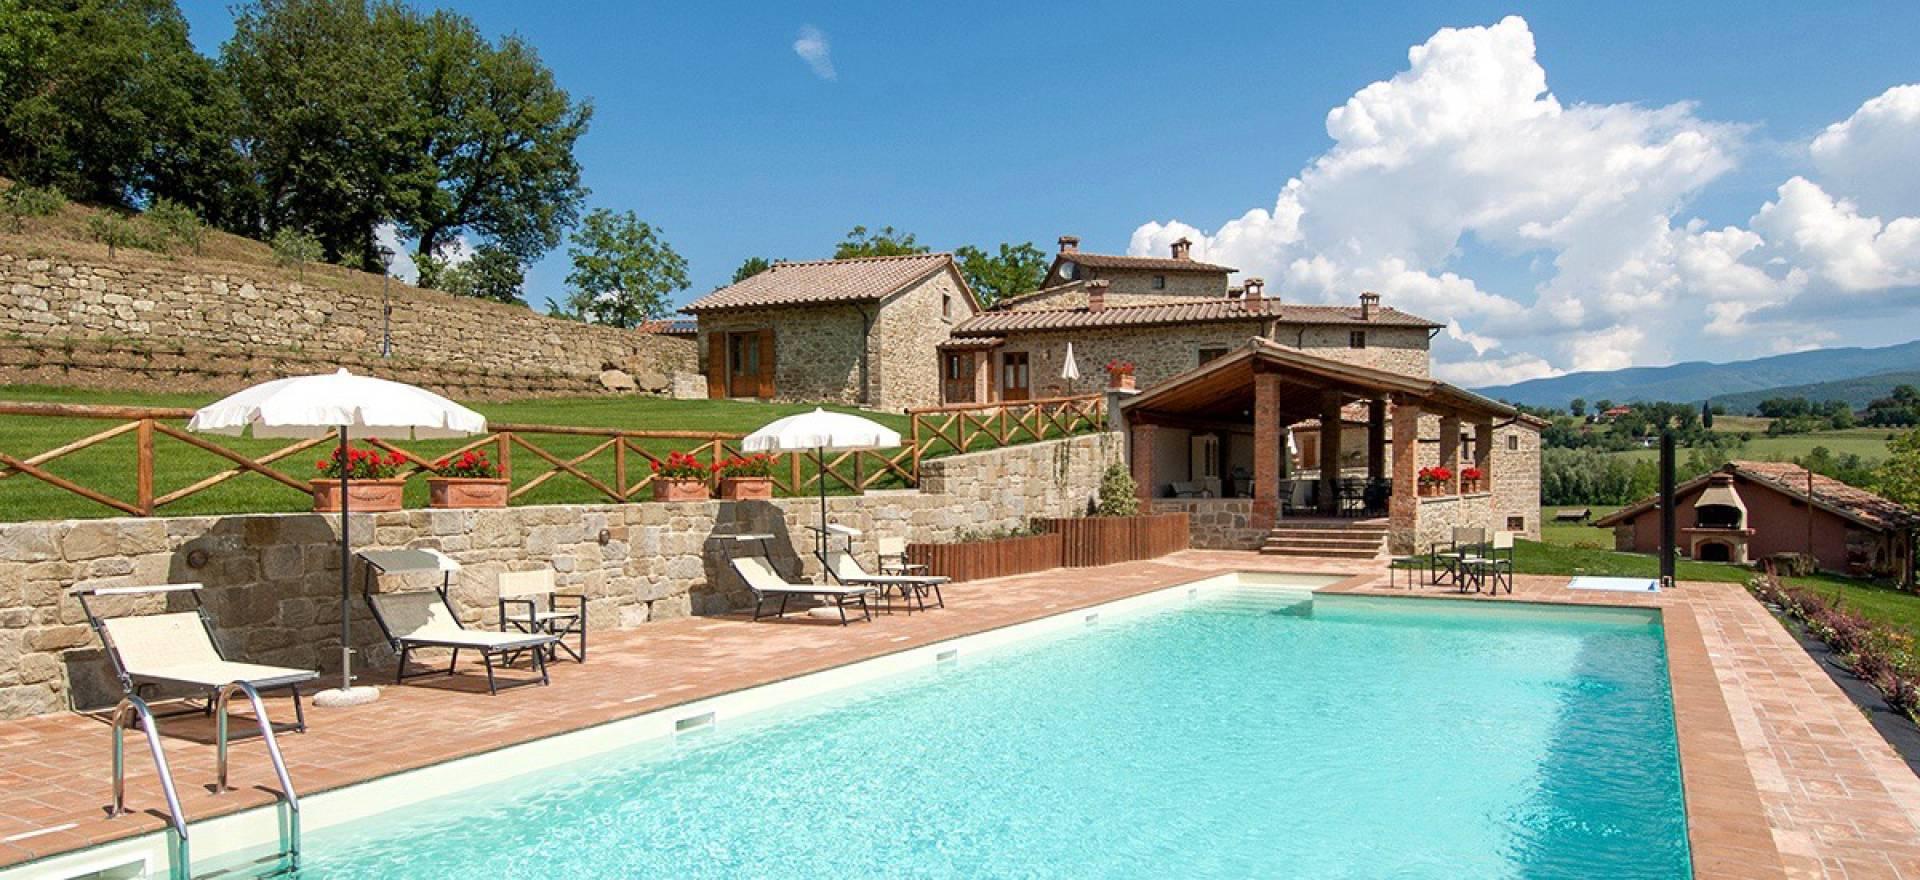 Agriturismo Toscana Incantevole agriturismo in Toscana per 4 famiglie